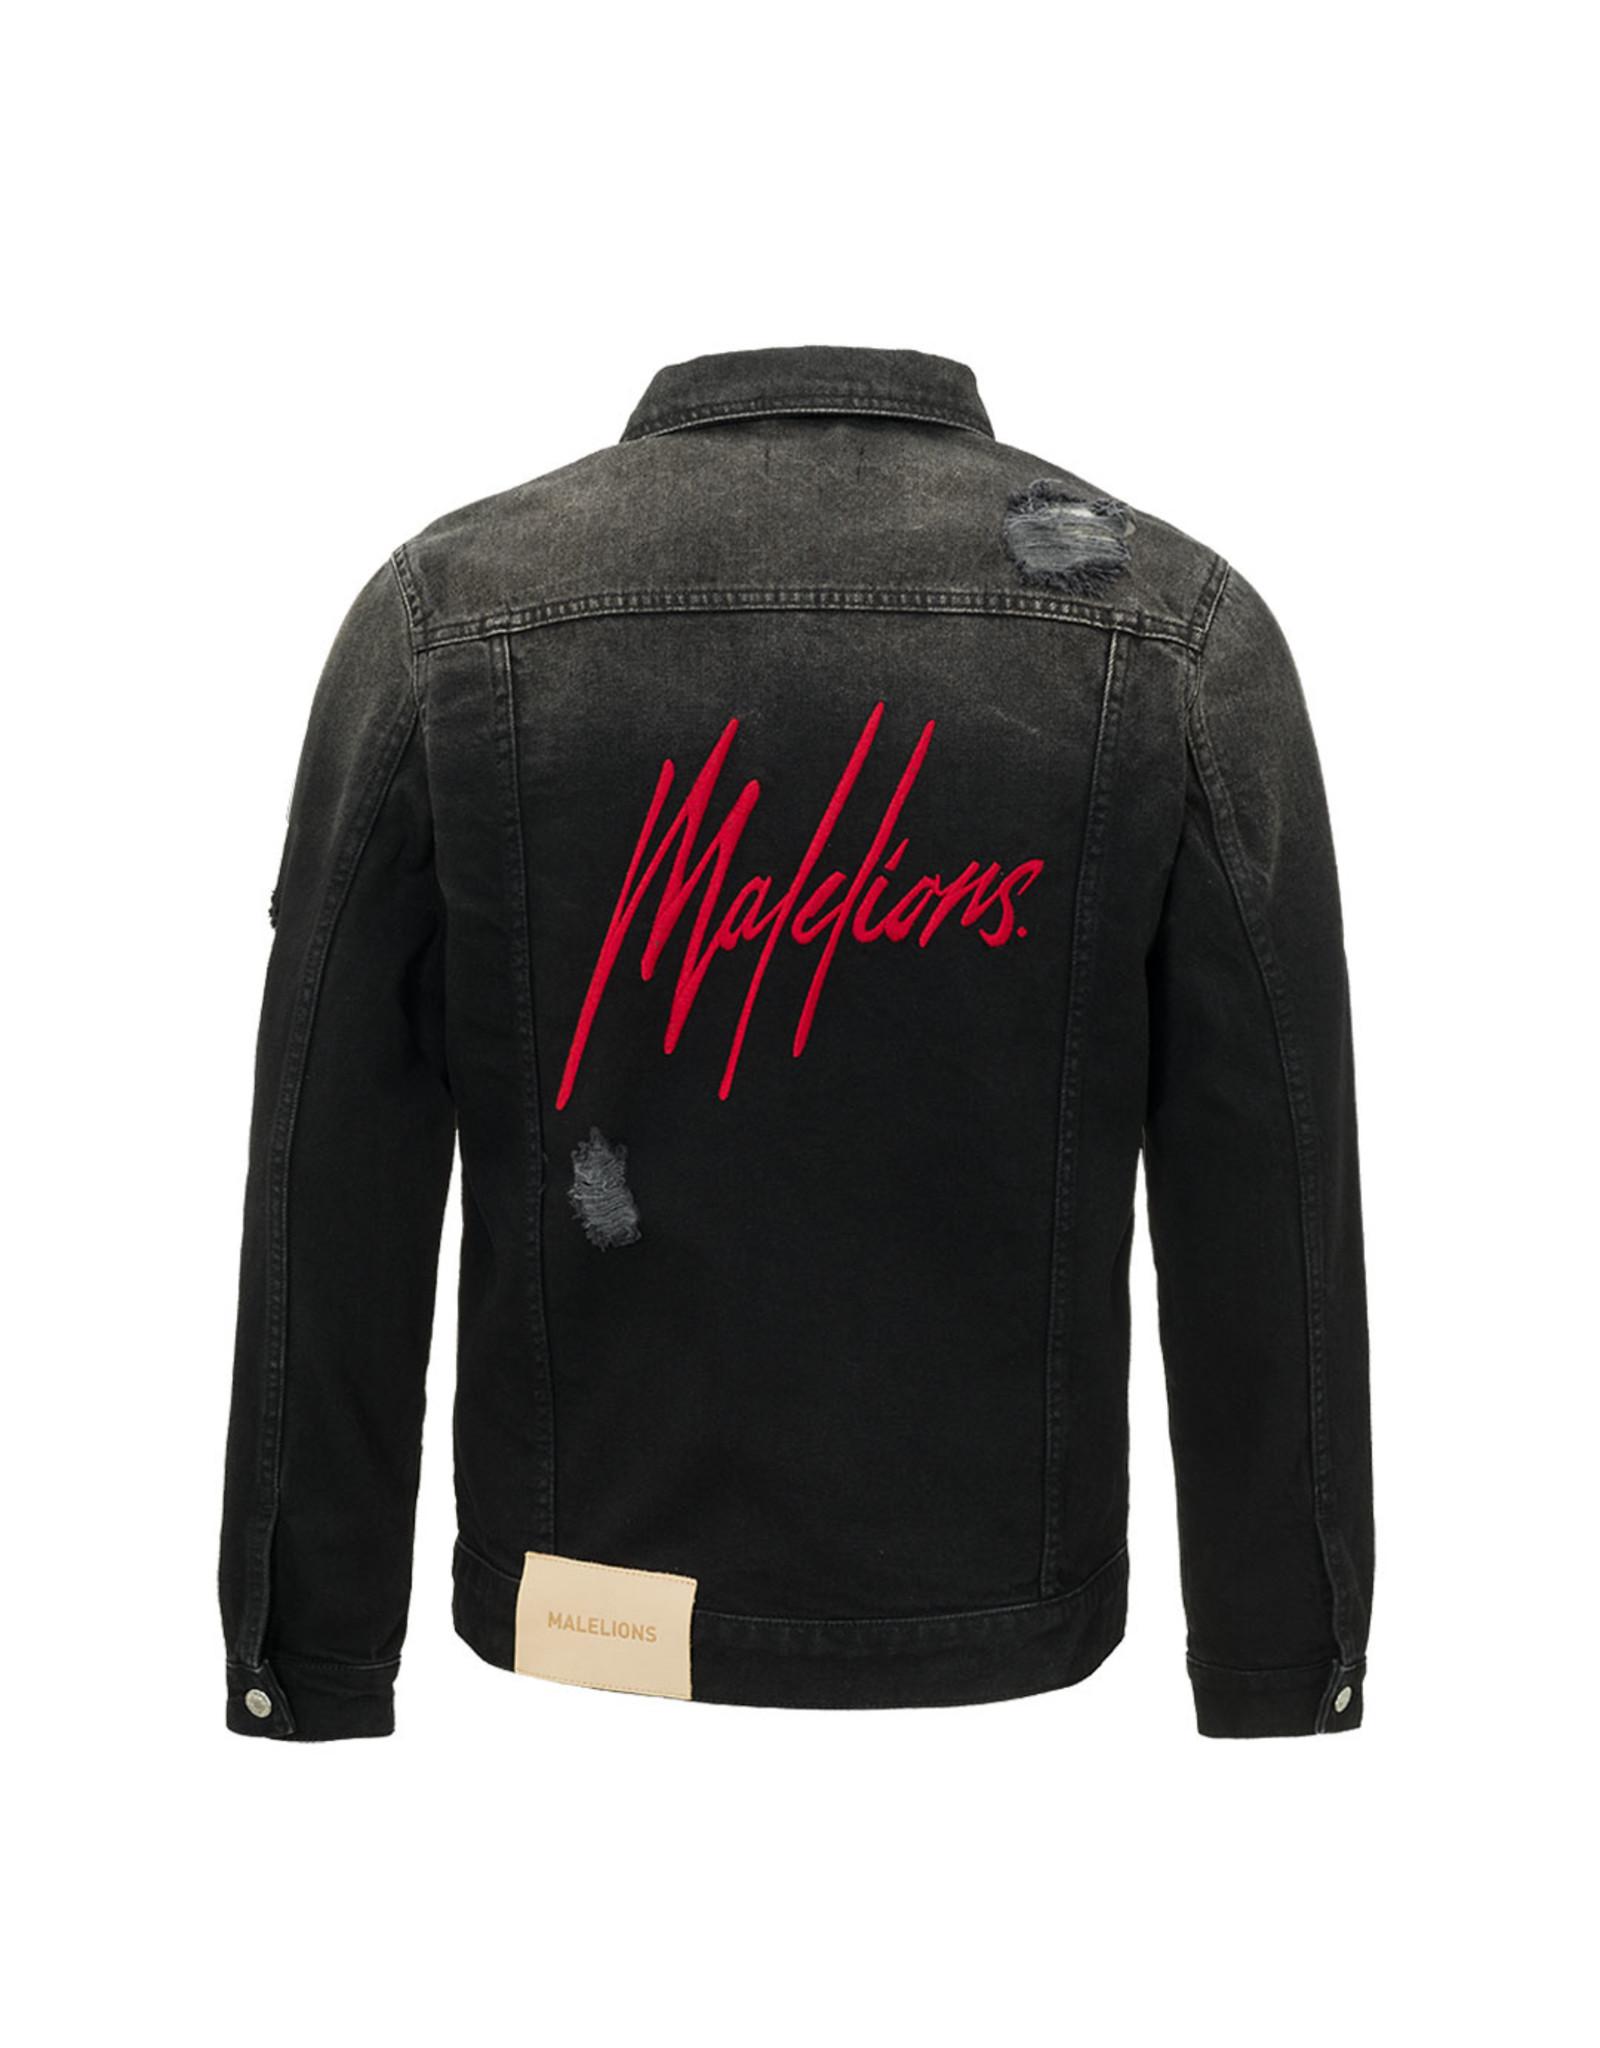 Malelions Junior Denim Jacket Black/TieDye